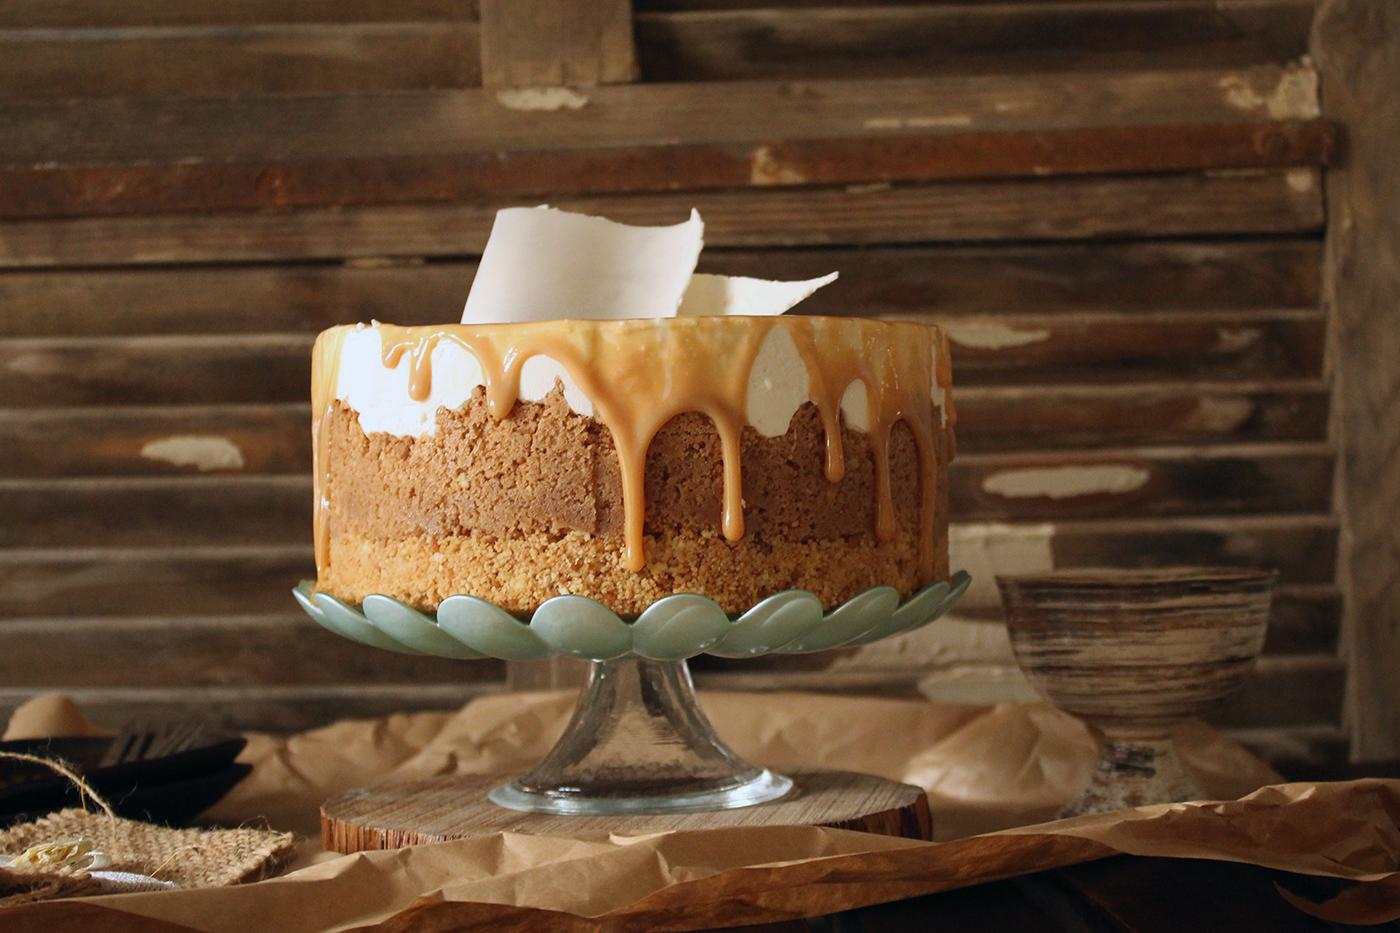 IMG 8303 - עוגות גבינה